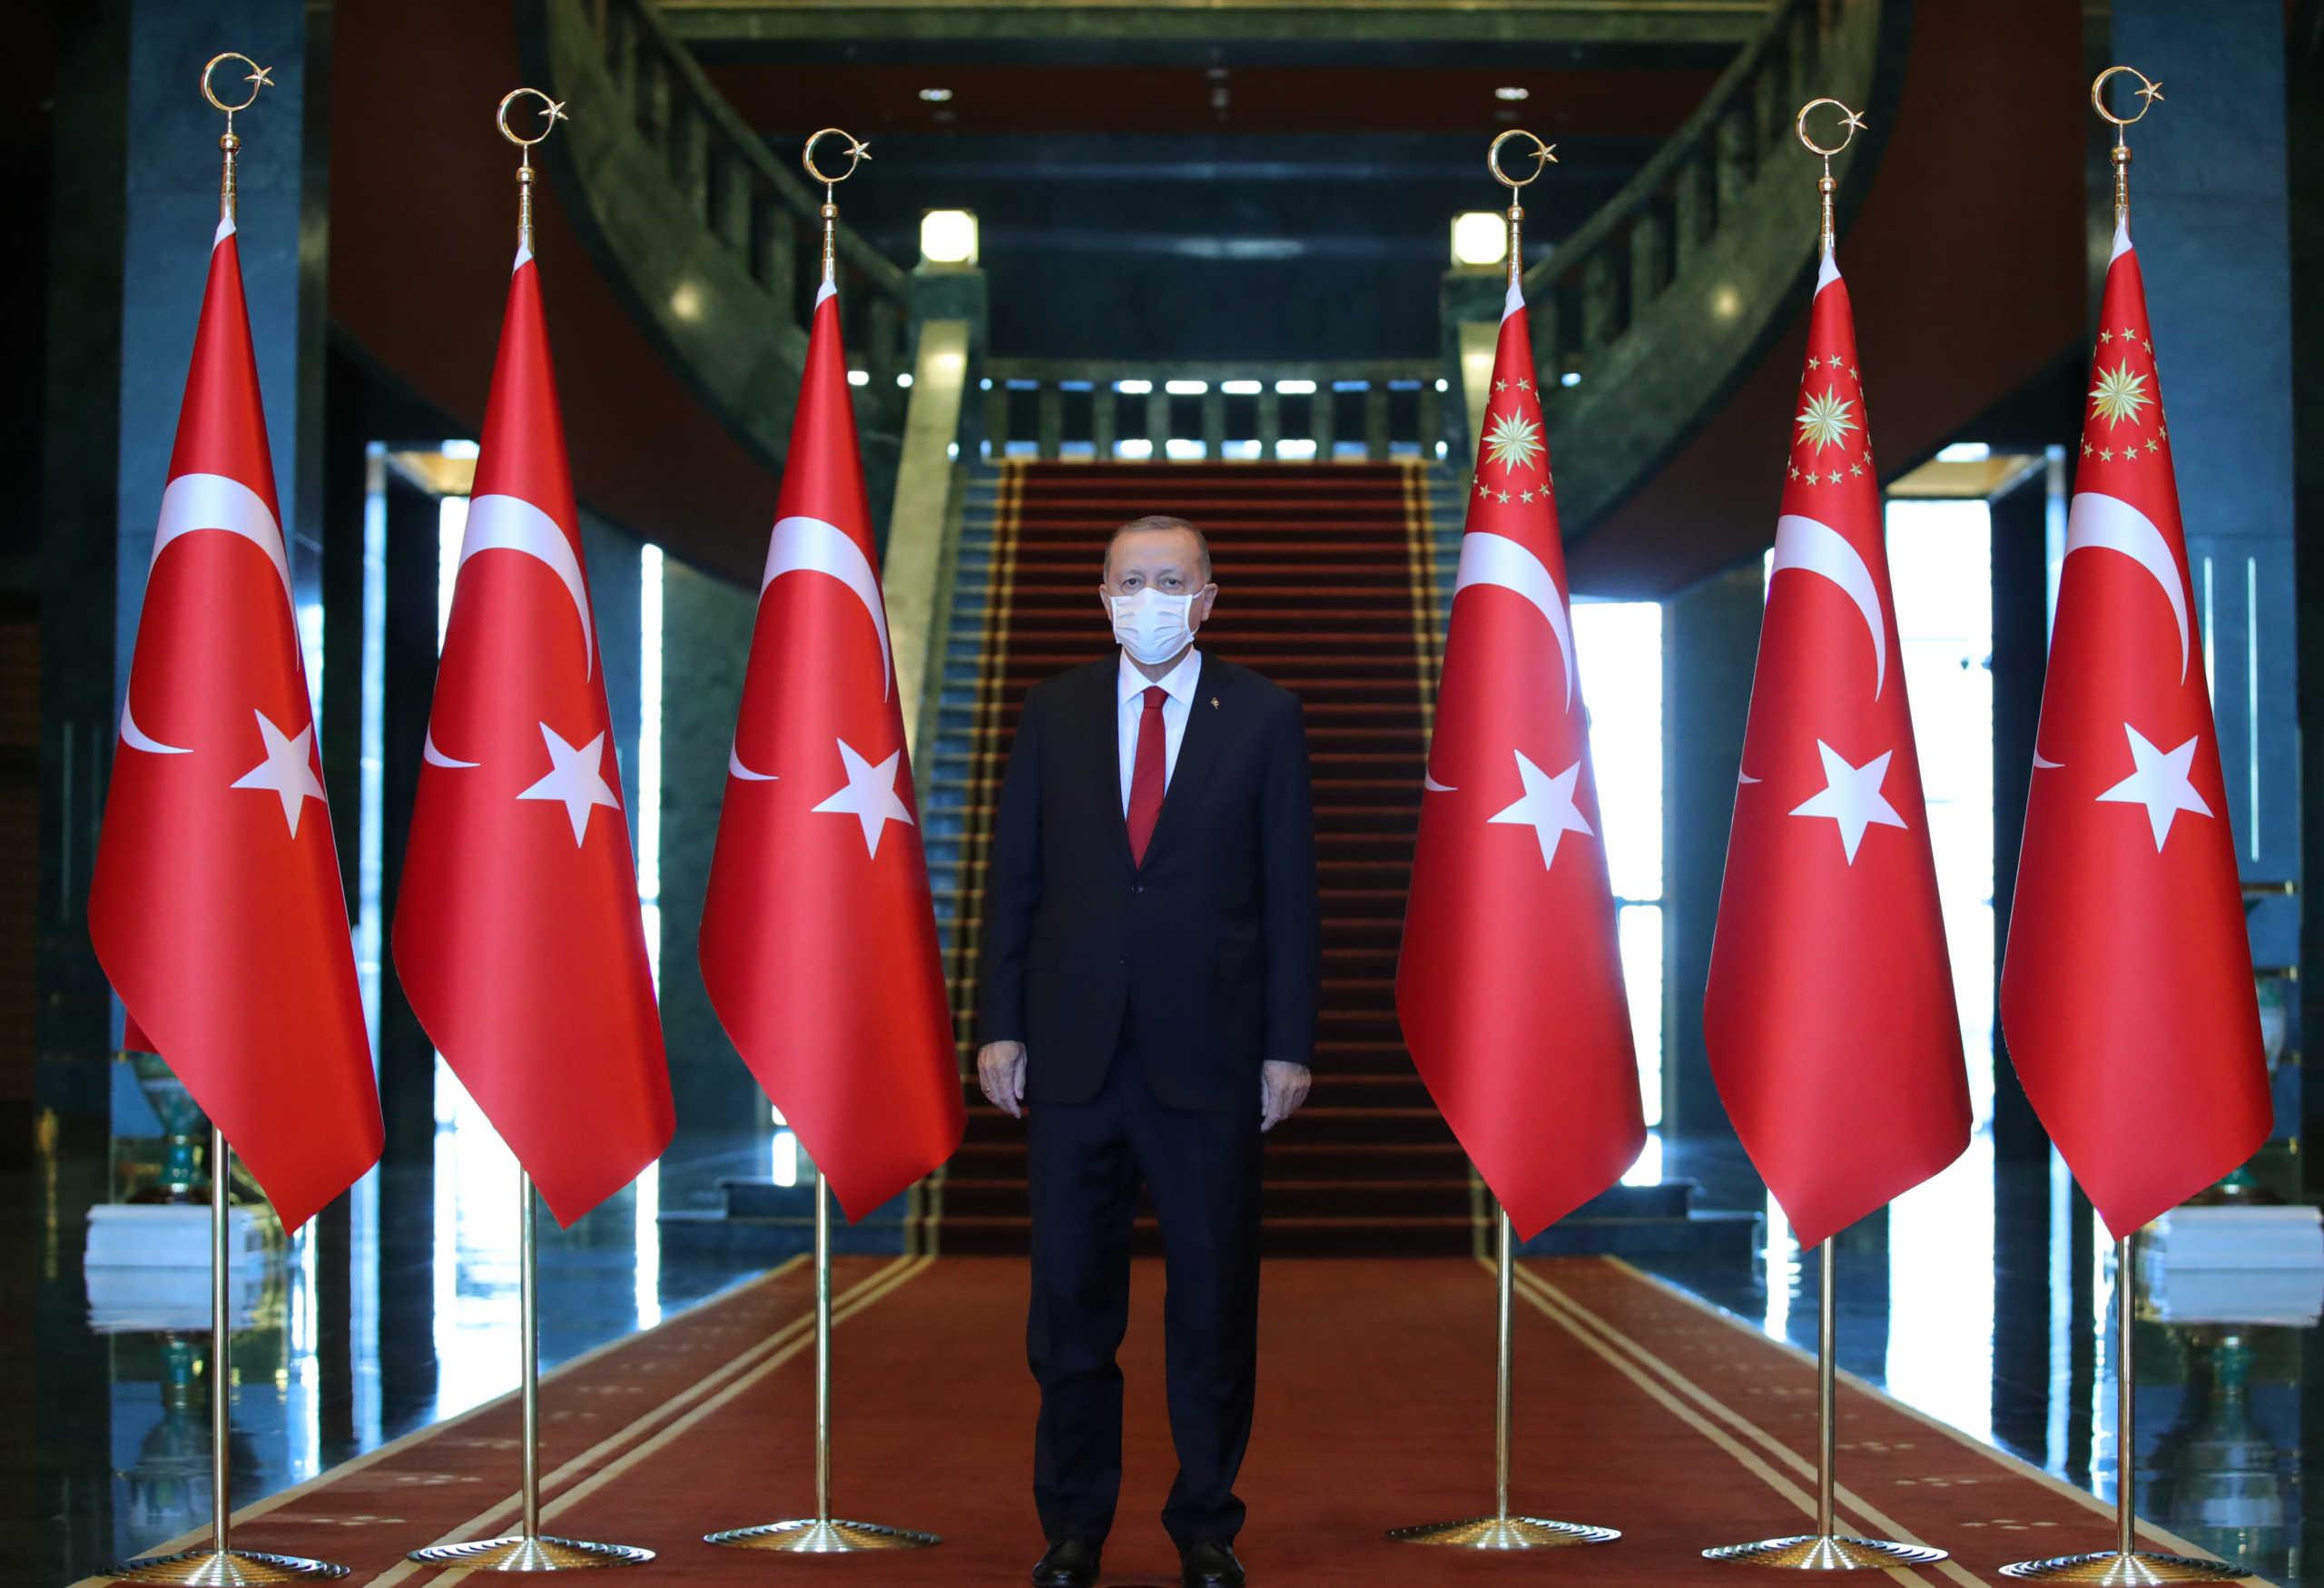 Milli-Görus: Το ισλαμιστικό κίνημα που σχετίζεται με τον Ερντογάν – Είναι υπό παρακολούθηση στη Γερμανία